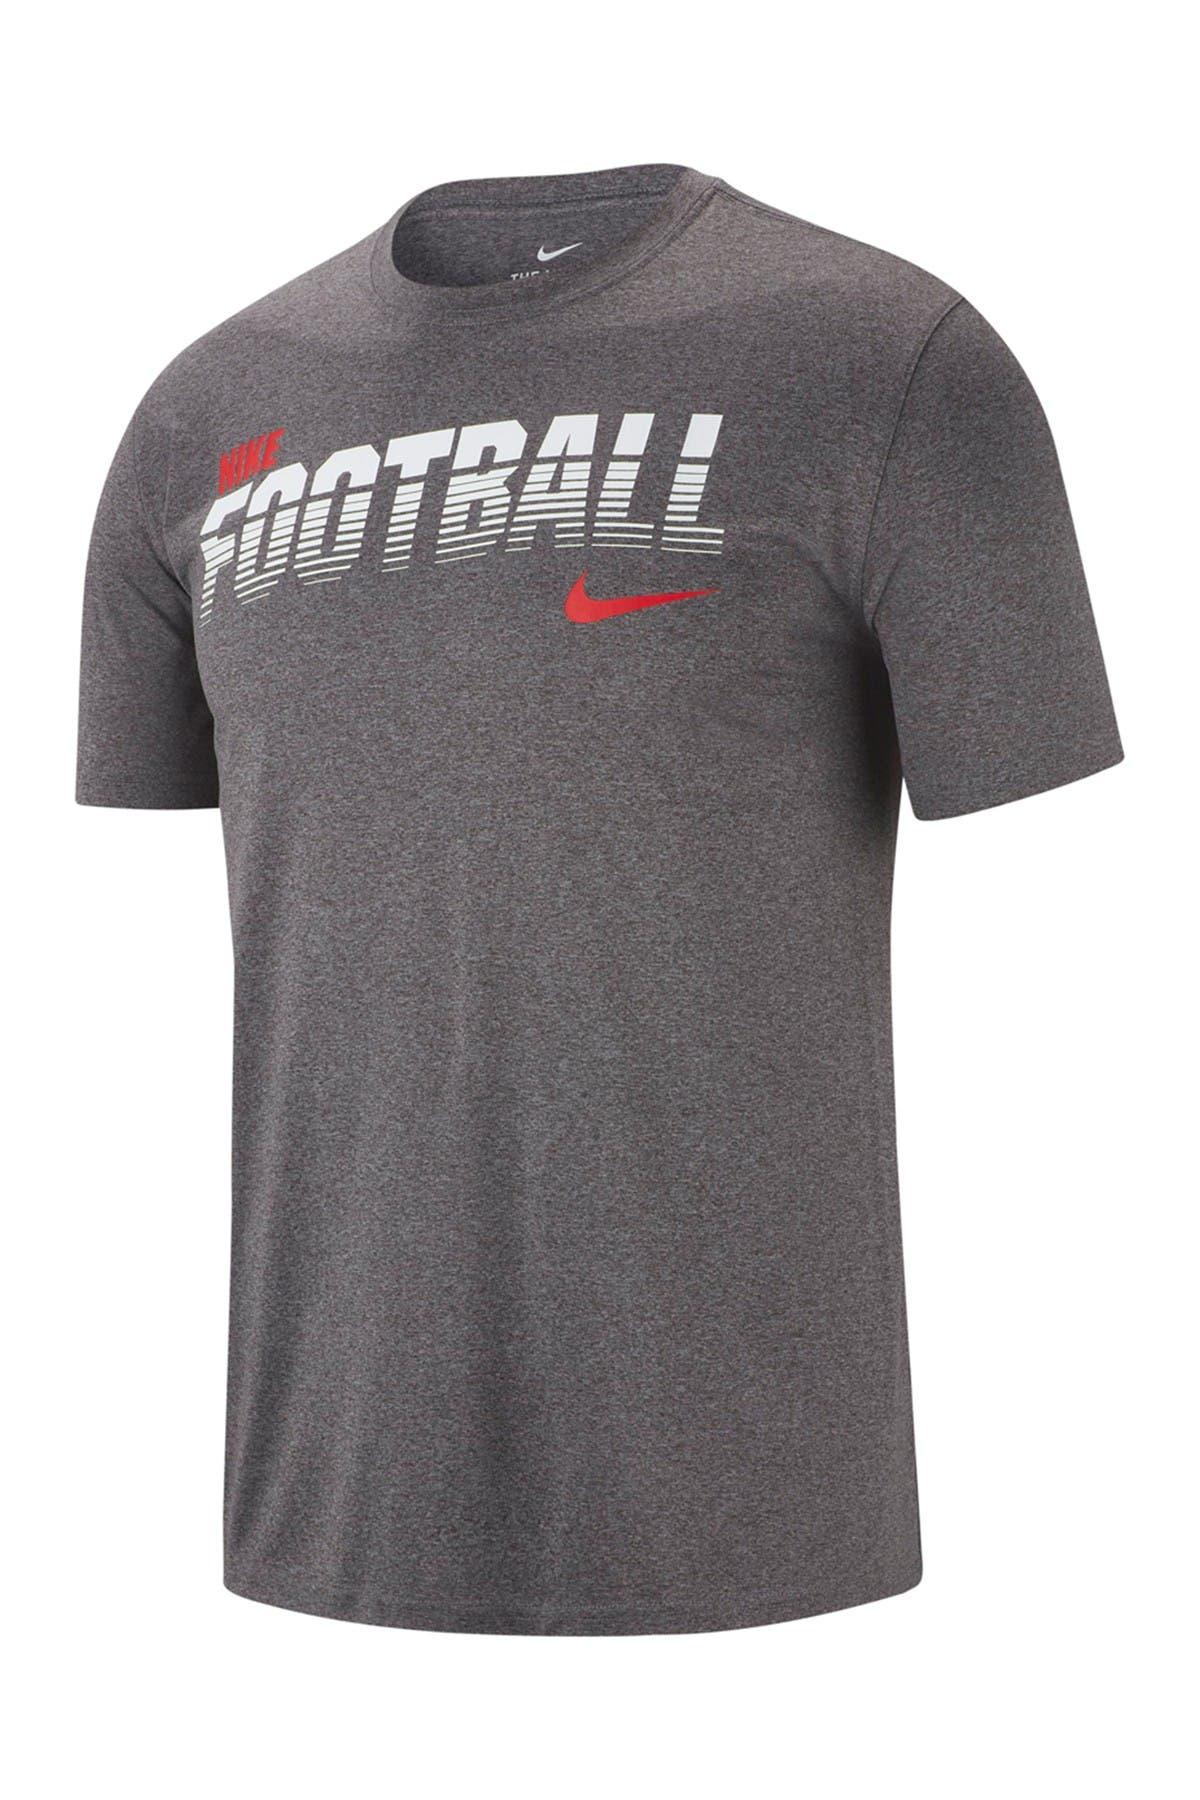 Furioso Cosquillas multitud  Nike   Dri-FIT Football T-Shirt   Nordstrom Rack